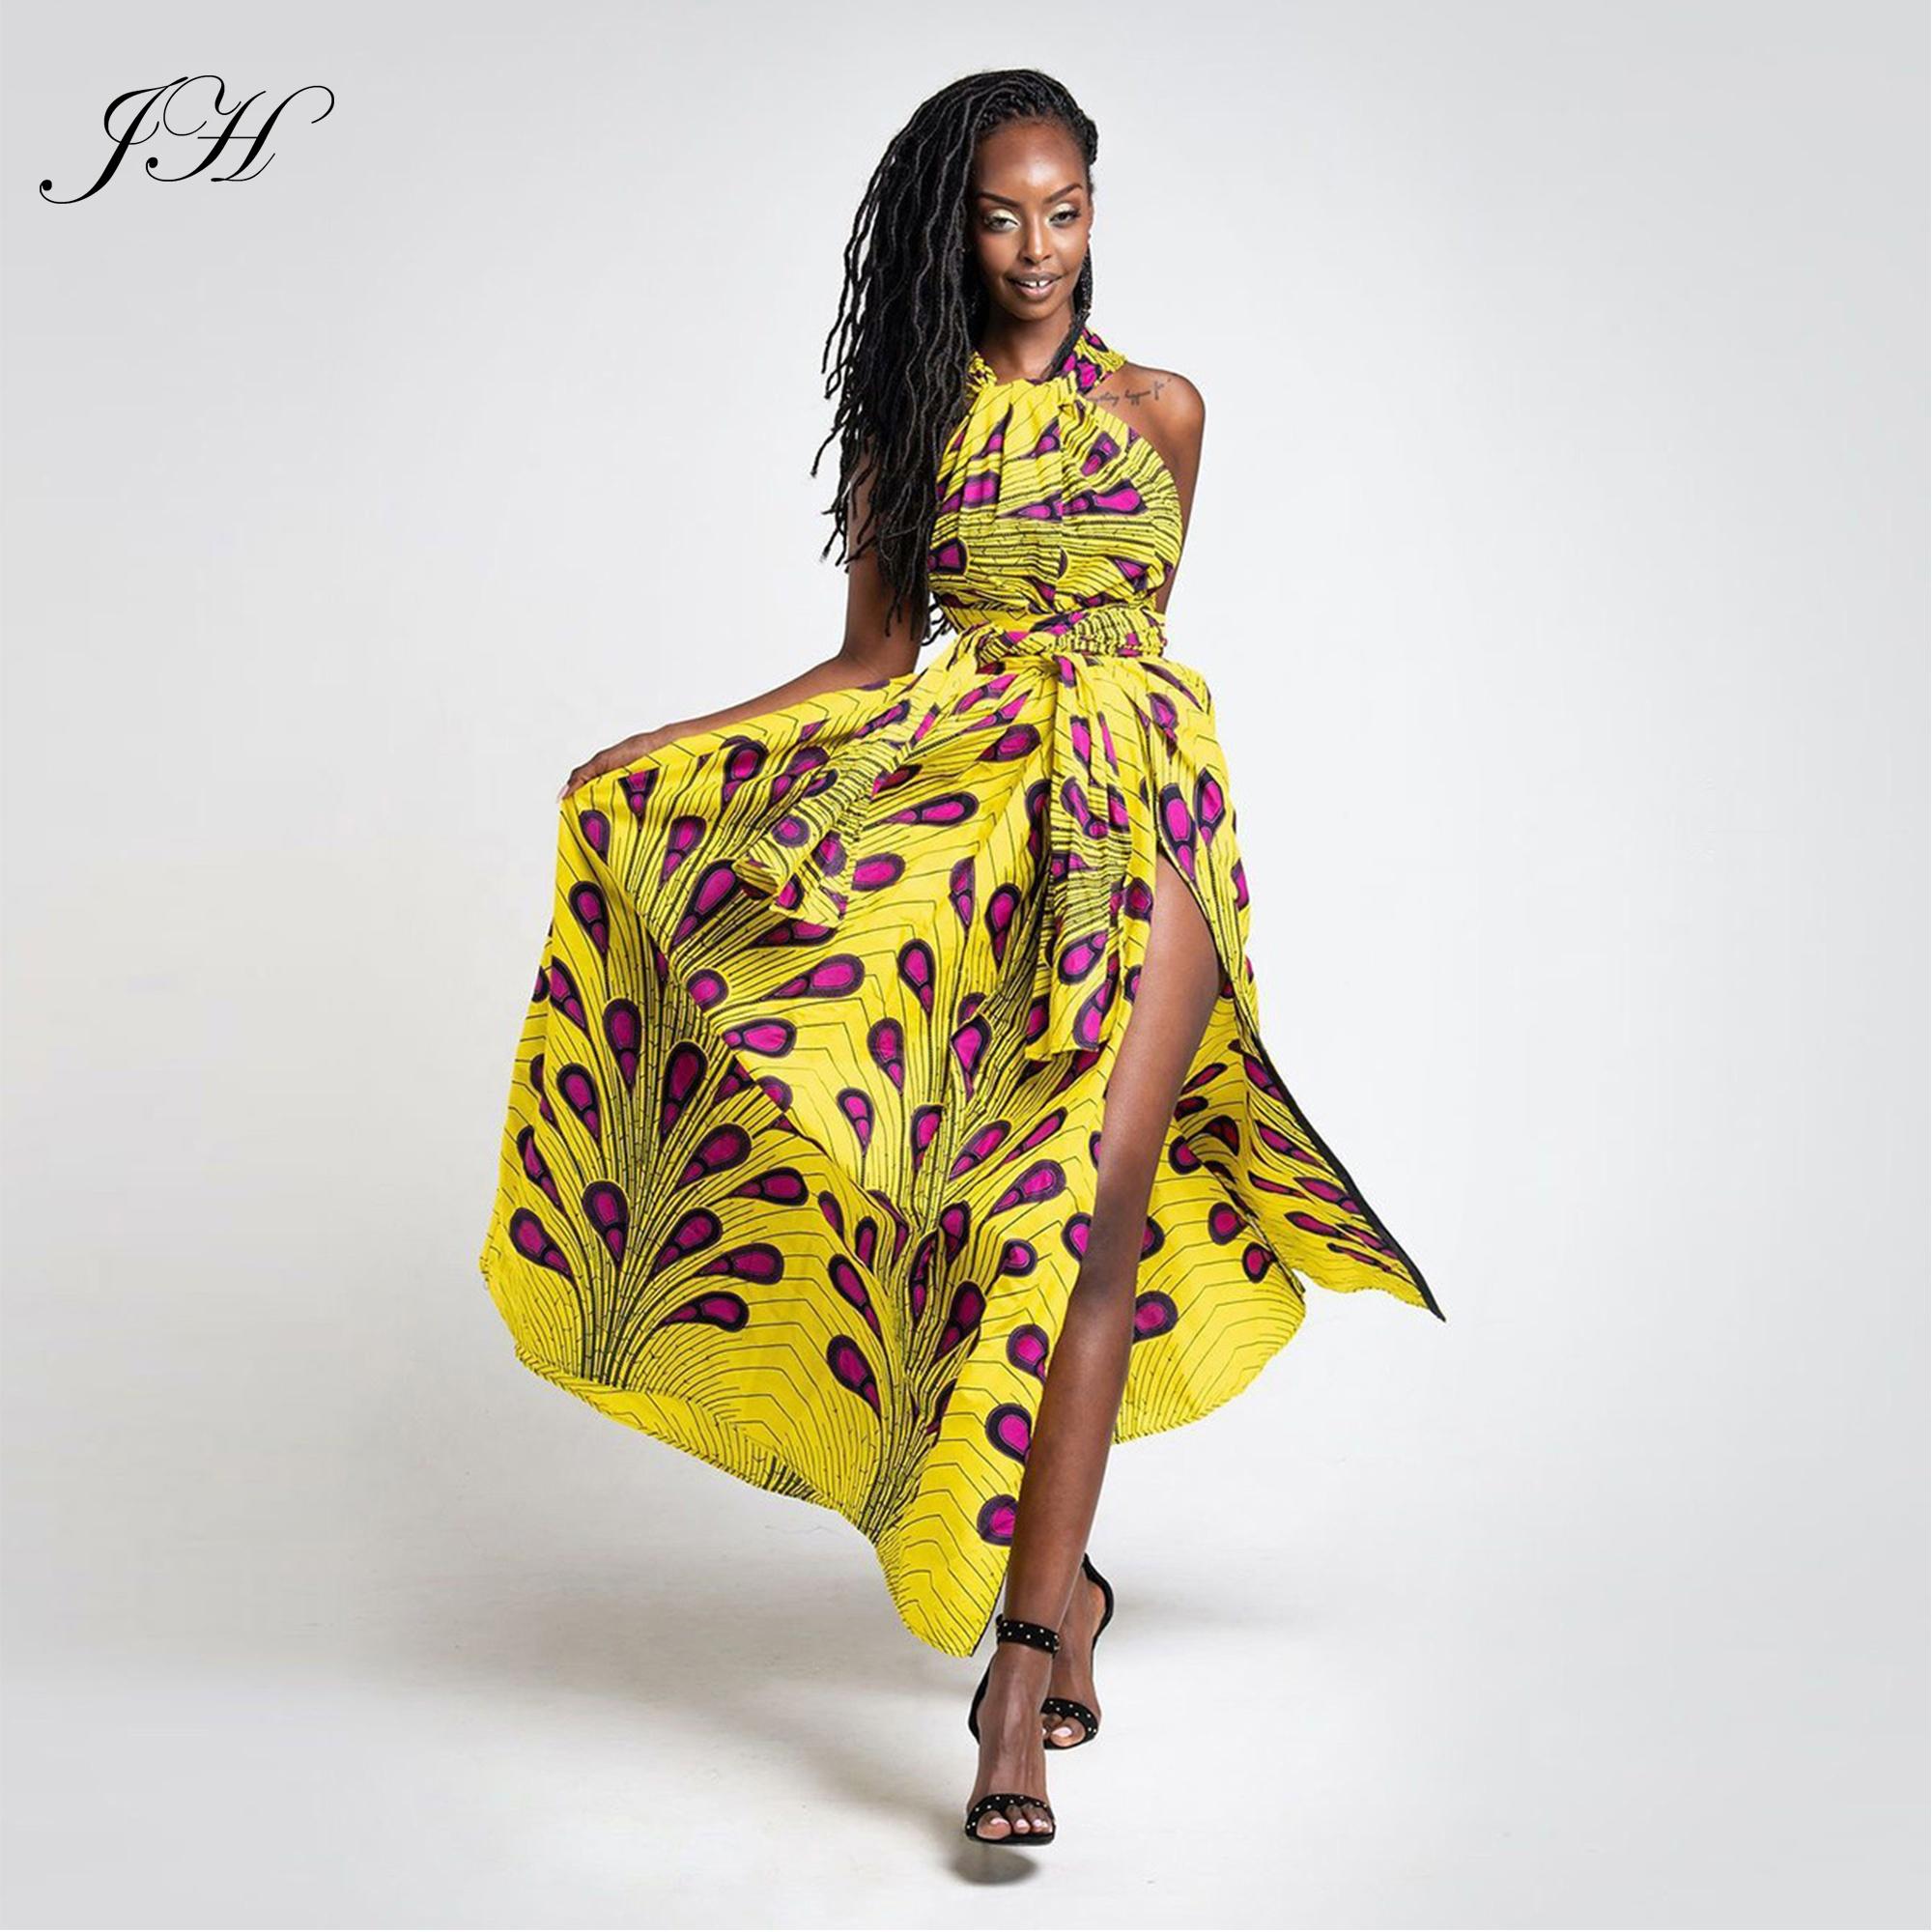 Latest African Kitenge Fashion 2019 Maxi Printed Peacock Women Dresses Sexy Bandage Fancy Party Dress Buy African Women Dresses African Fashion Party Dress African Kitenge Fashion 2019 Dress Product On Alibaba Com